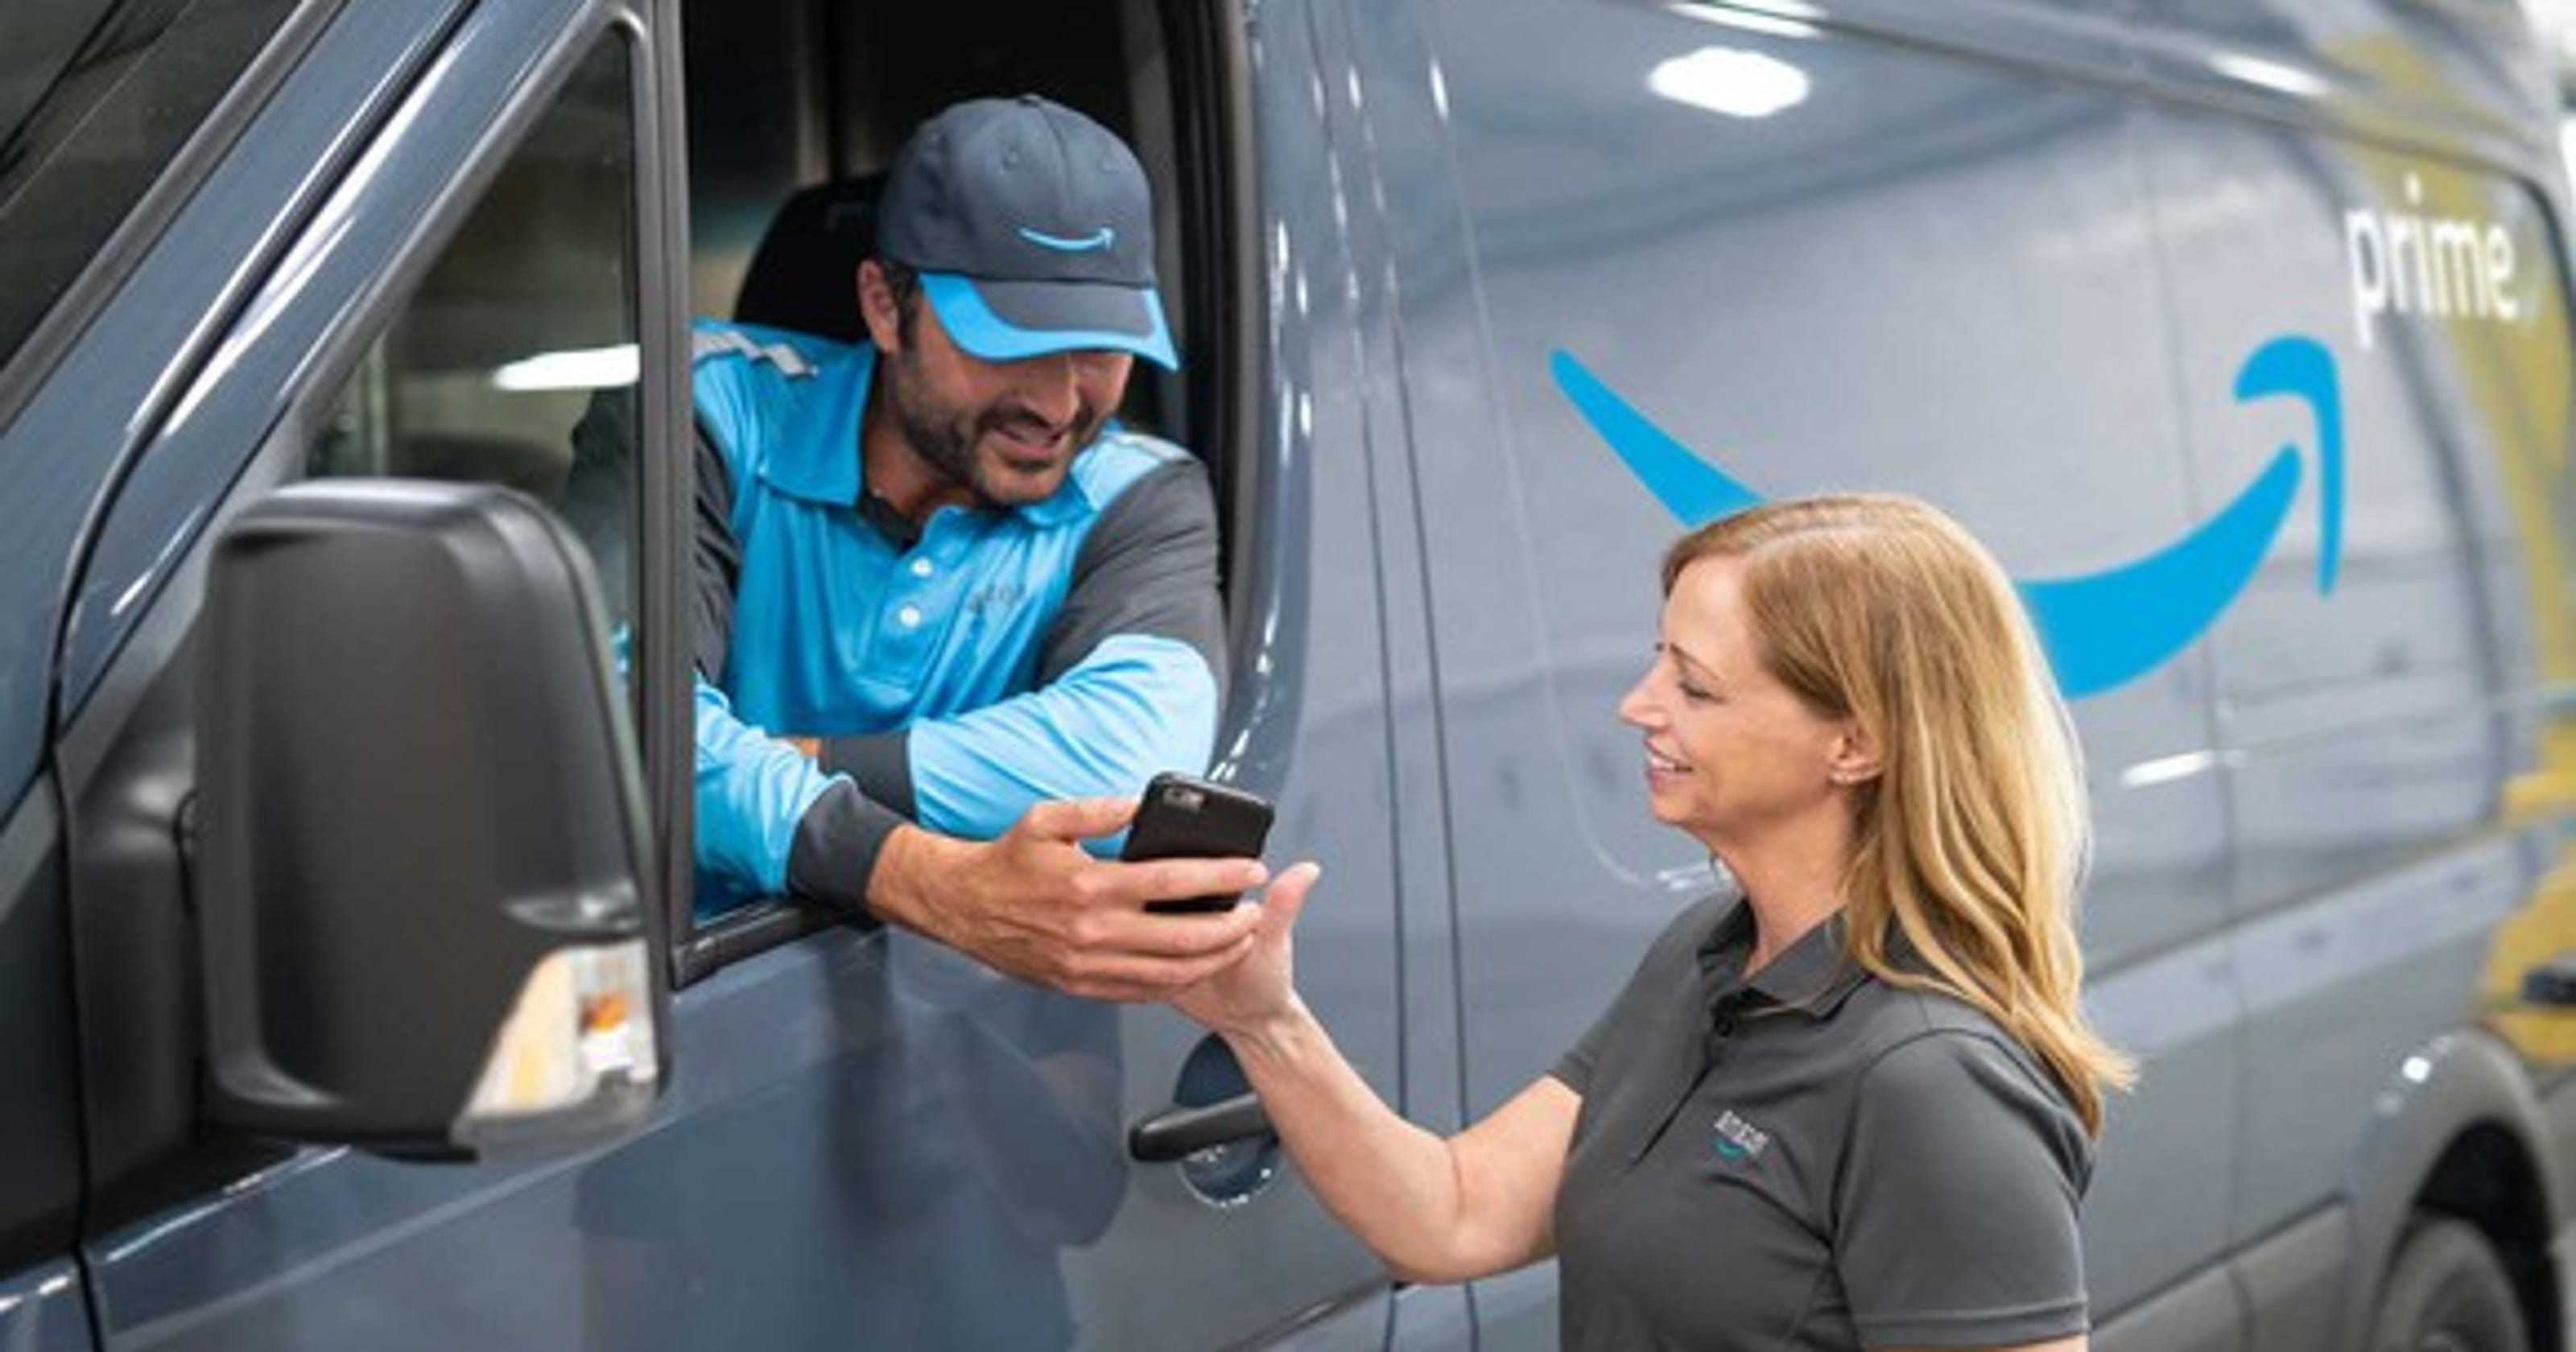 Amazon hiring to fill more than 200 work-at-home virtual jobs